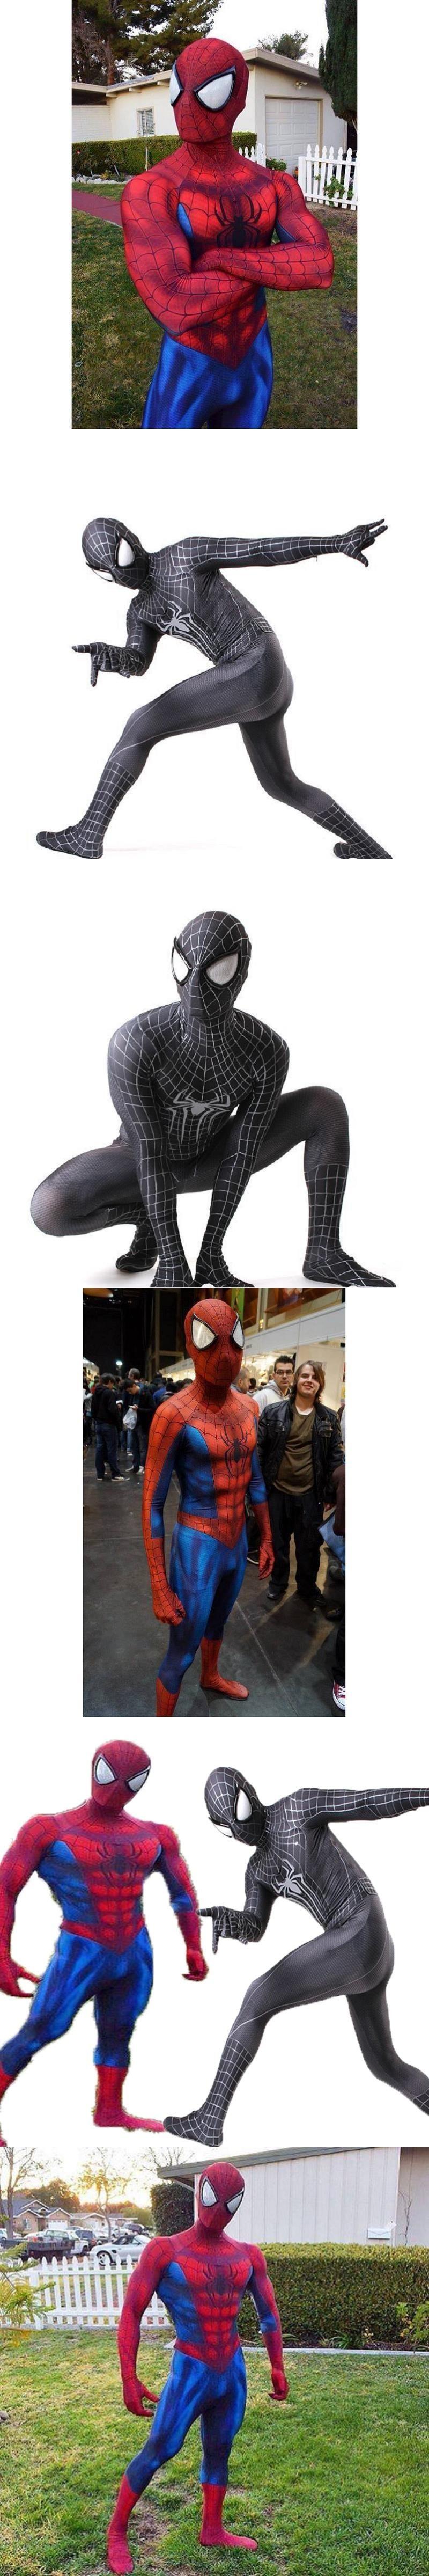 Spiderman Costume 3D Print Cosplay Zentai Suit Spandex Male Comic Spider-man Superhero Costume S  sc 1 st  Pinterest & Spiderman Costume 3D Print Cosplay Zentai Suit Spandex Male Comic ...